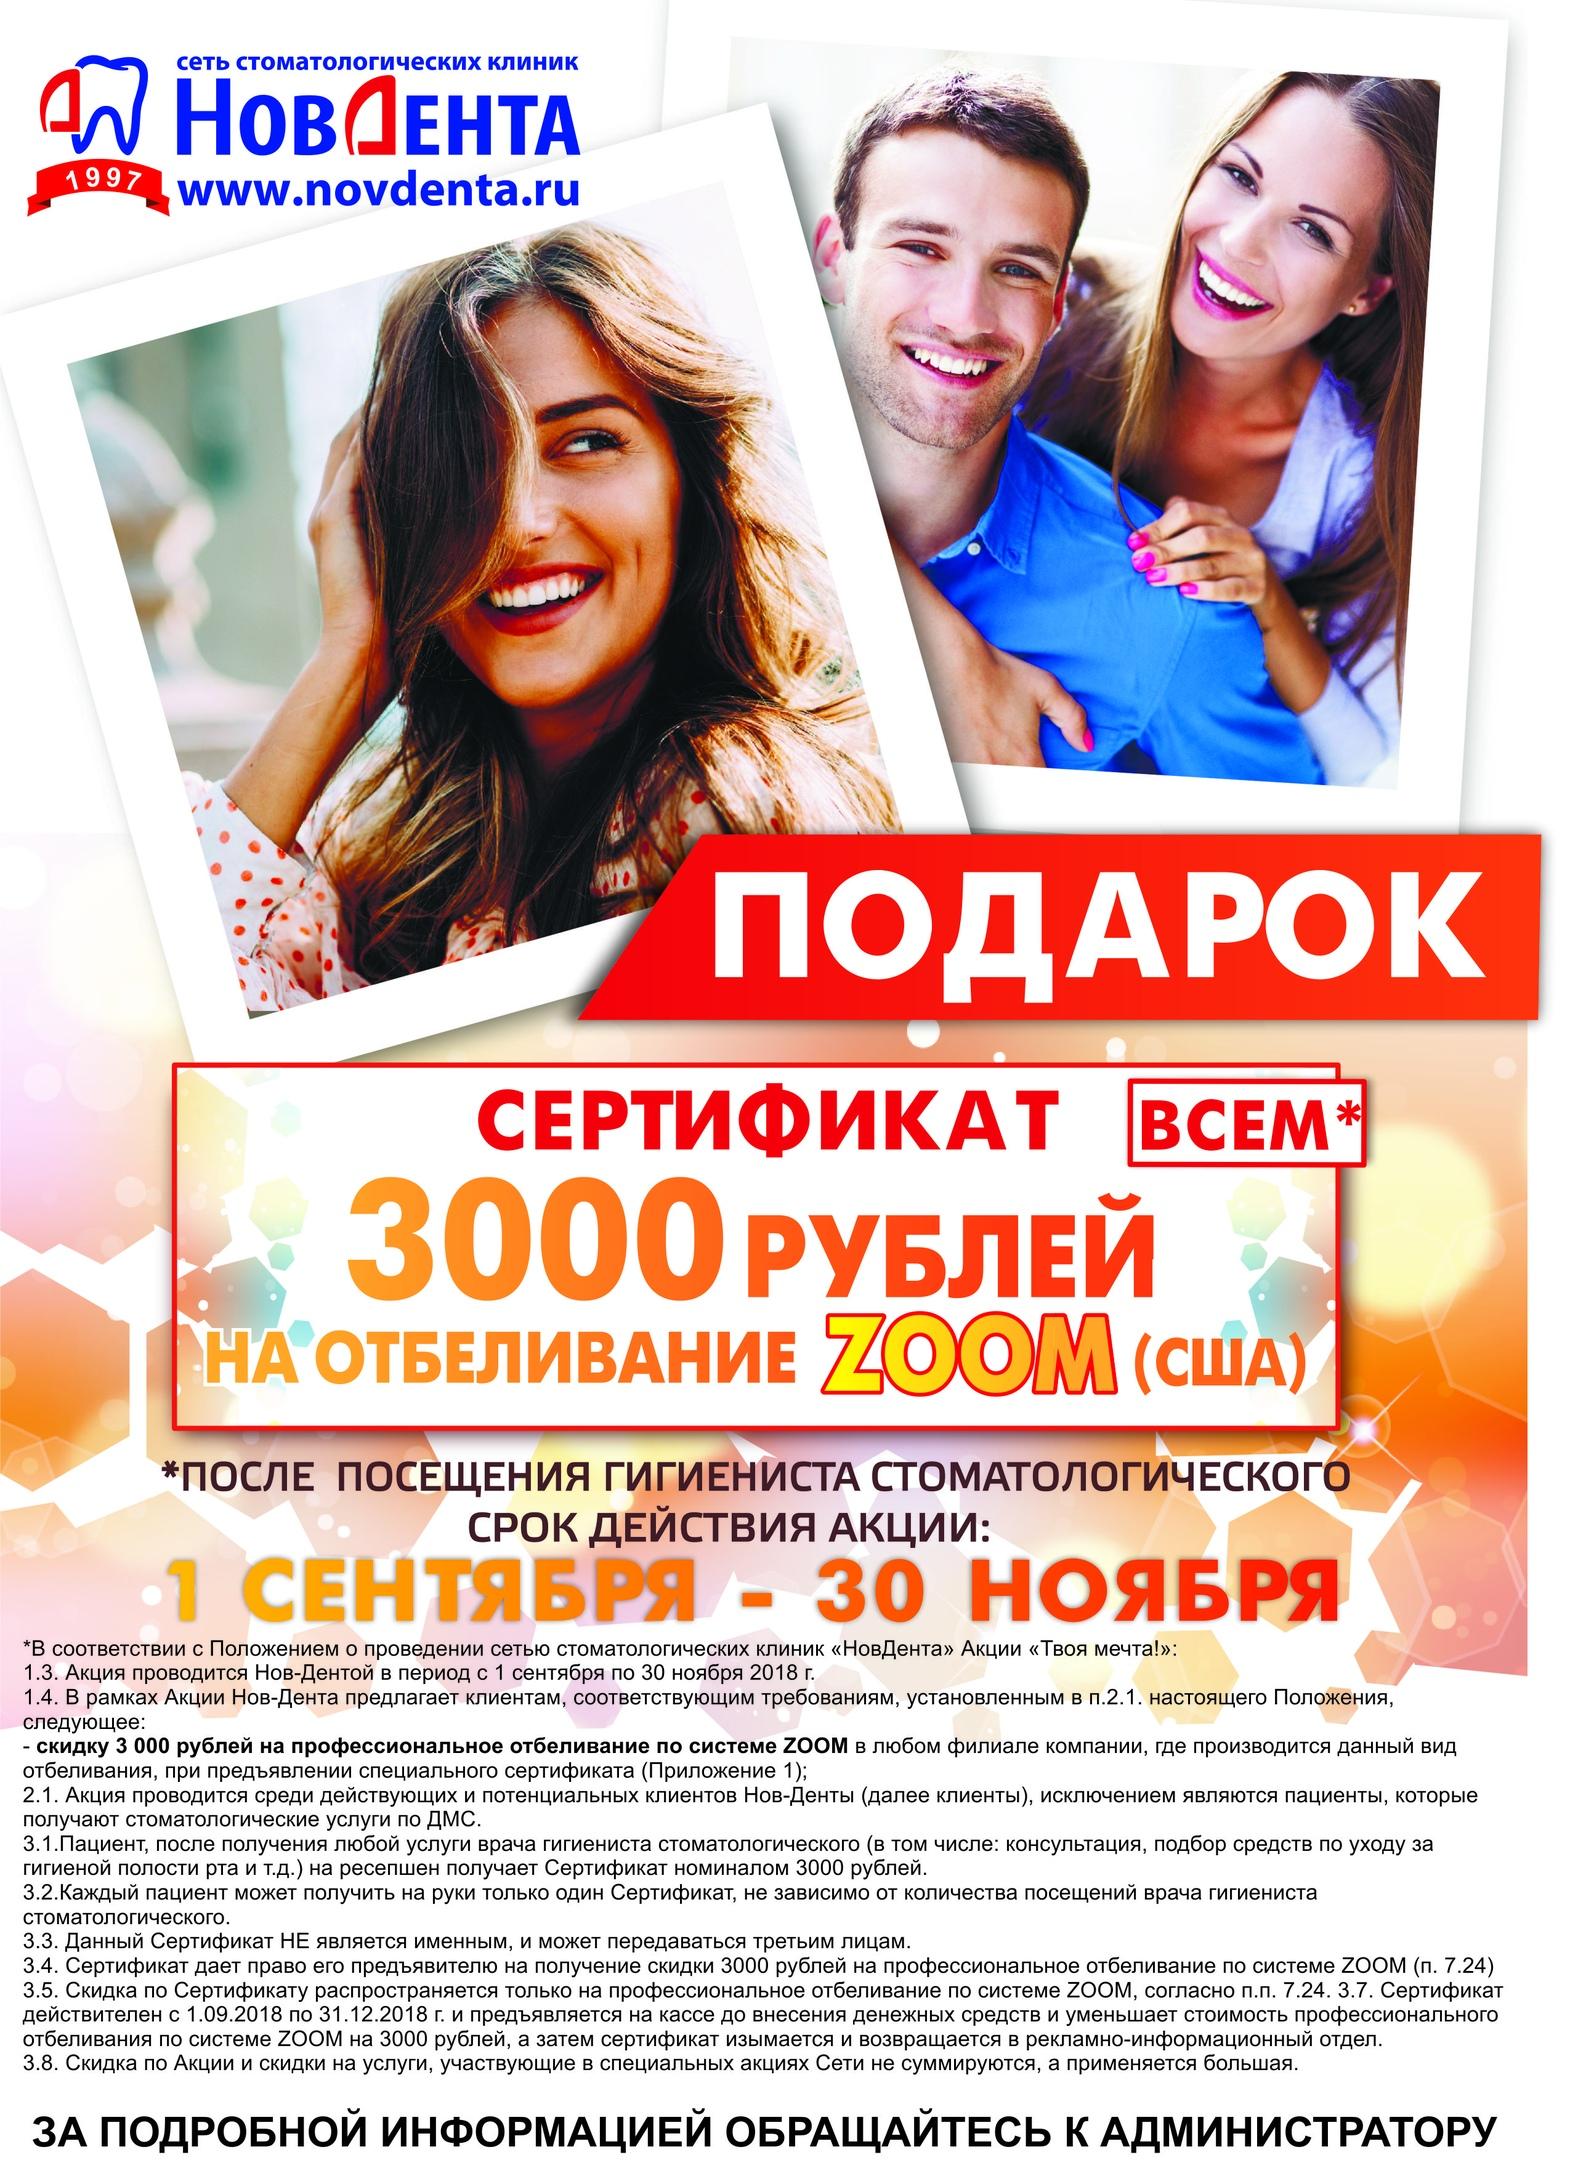 https://pp.userapi.com/c830400/v830400895/186c0e/CzcNvHffb2I.jpg